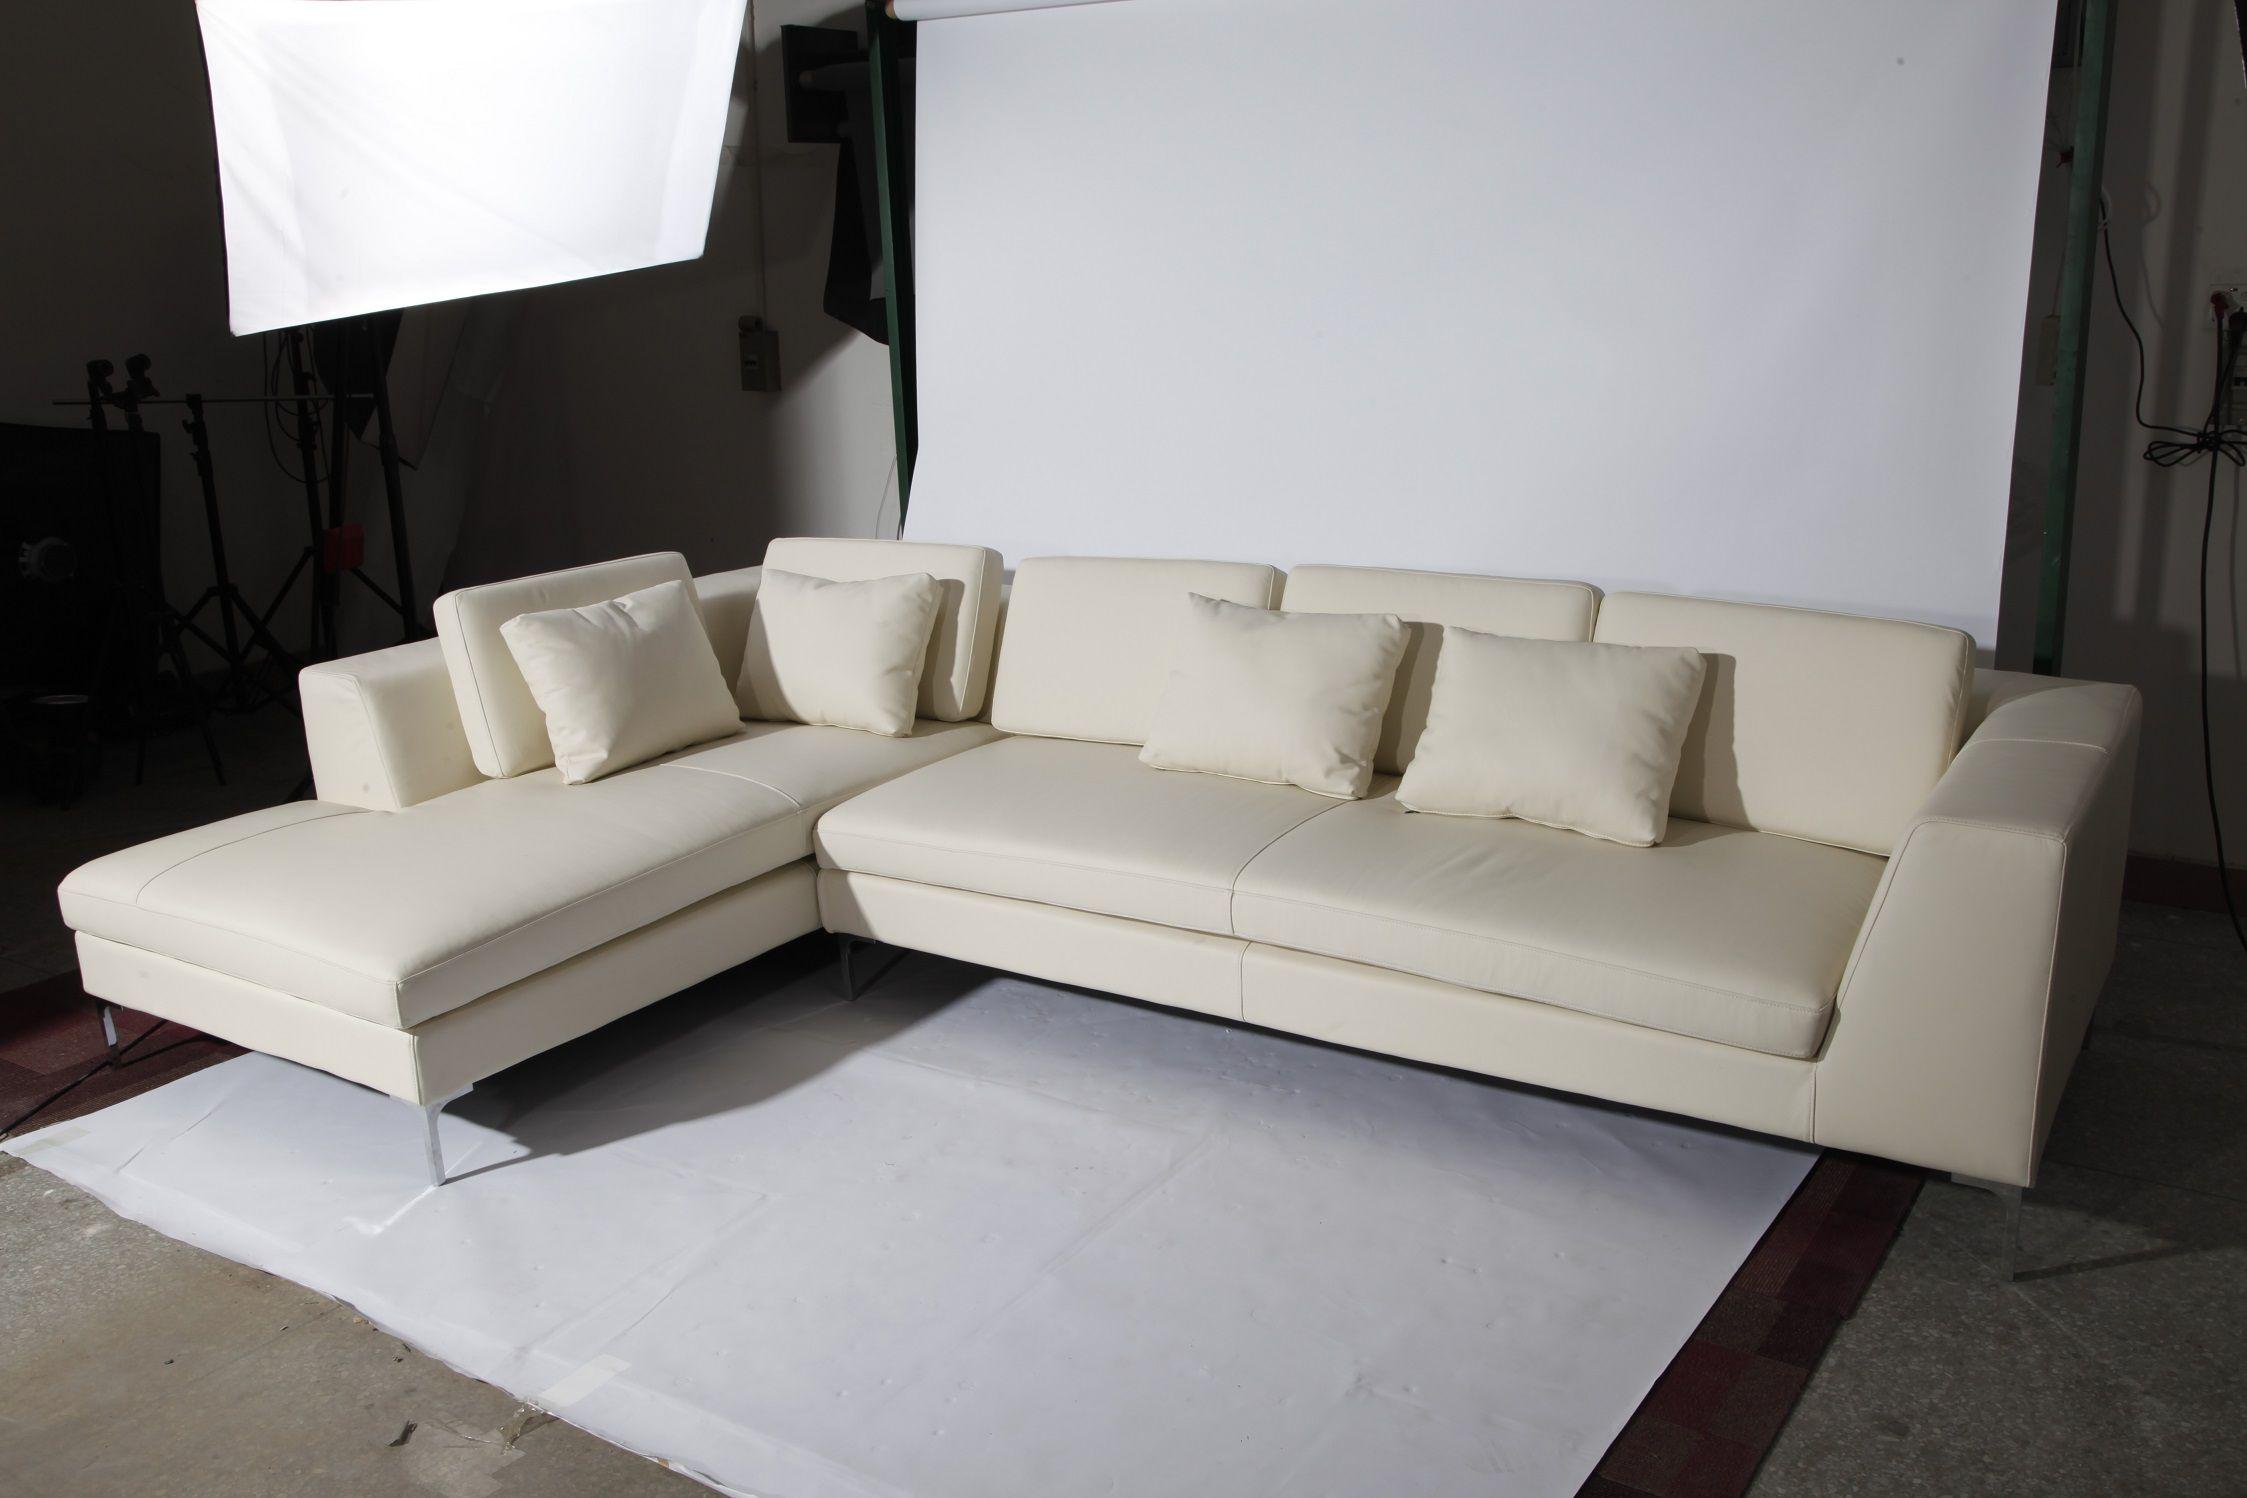 Peachy Bb Italia Charles Sectional Sofa Replica In Ivory Ltalian Ibusinesslaw Wood Chair Design Ideas Ibusinesslaworg